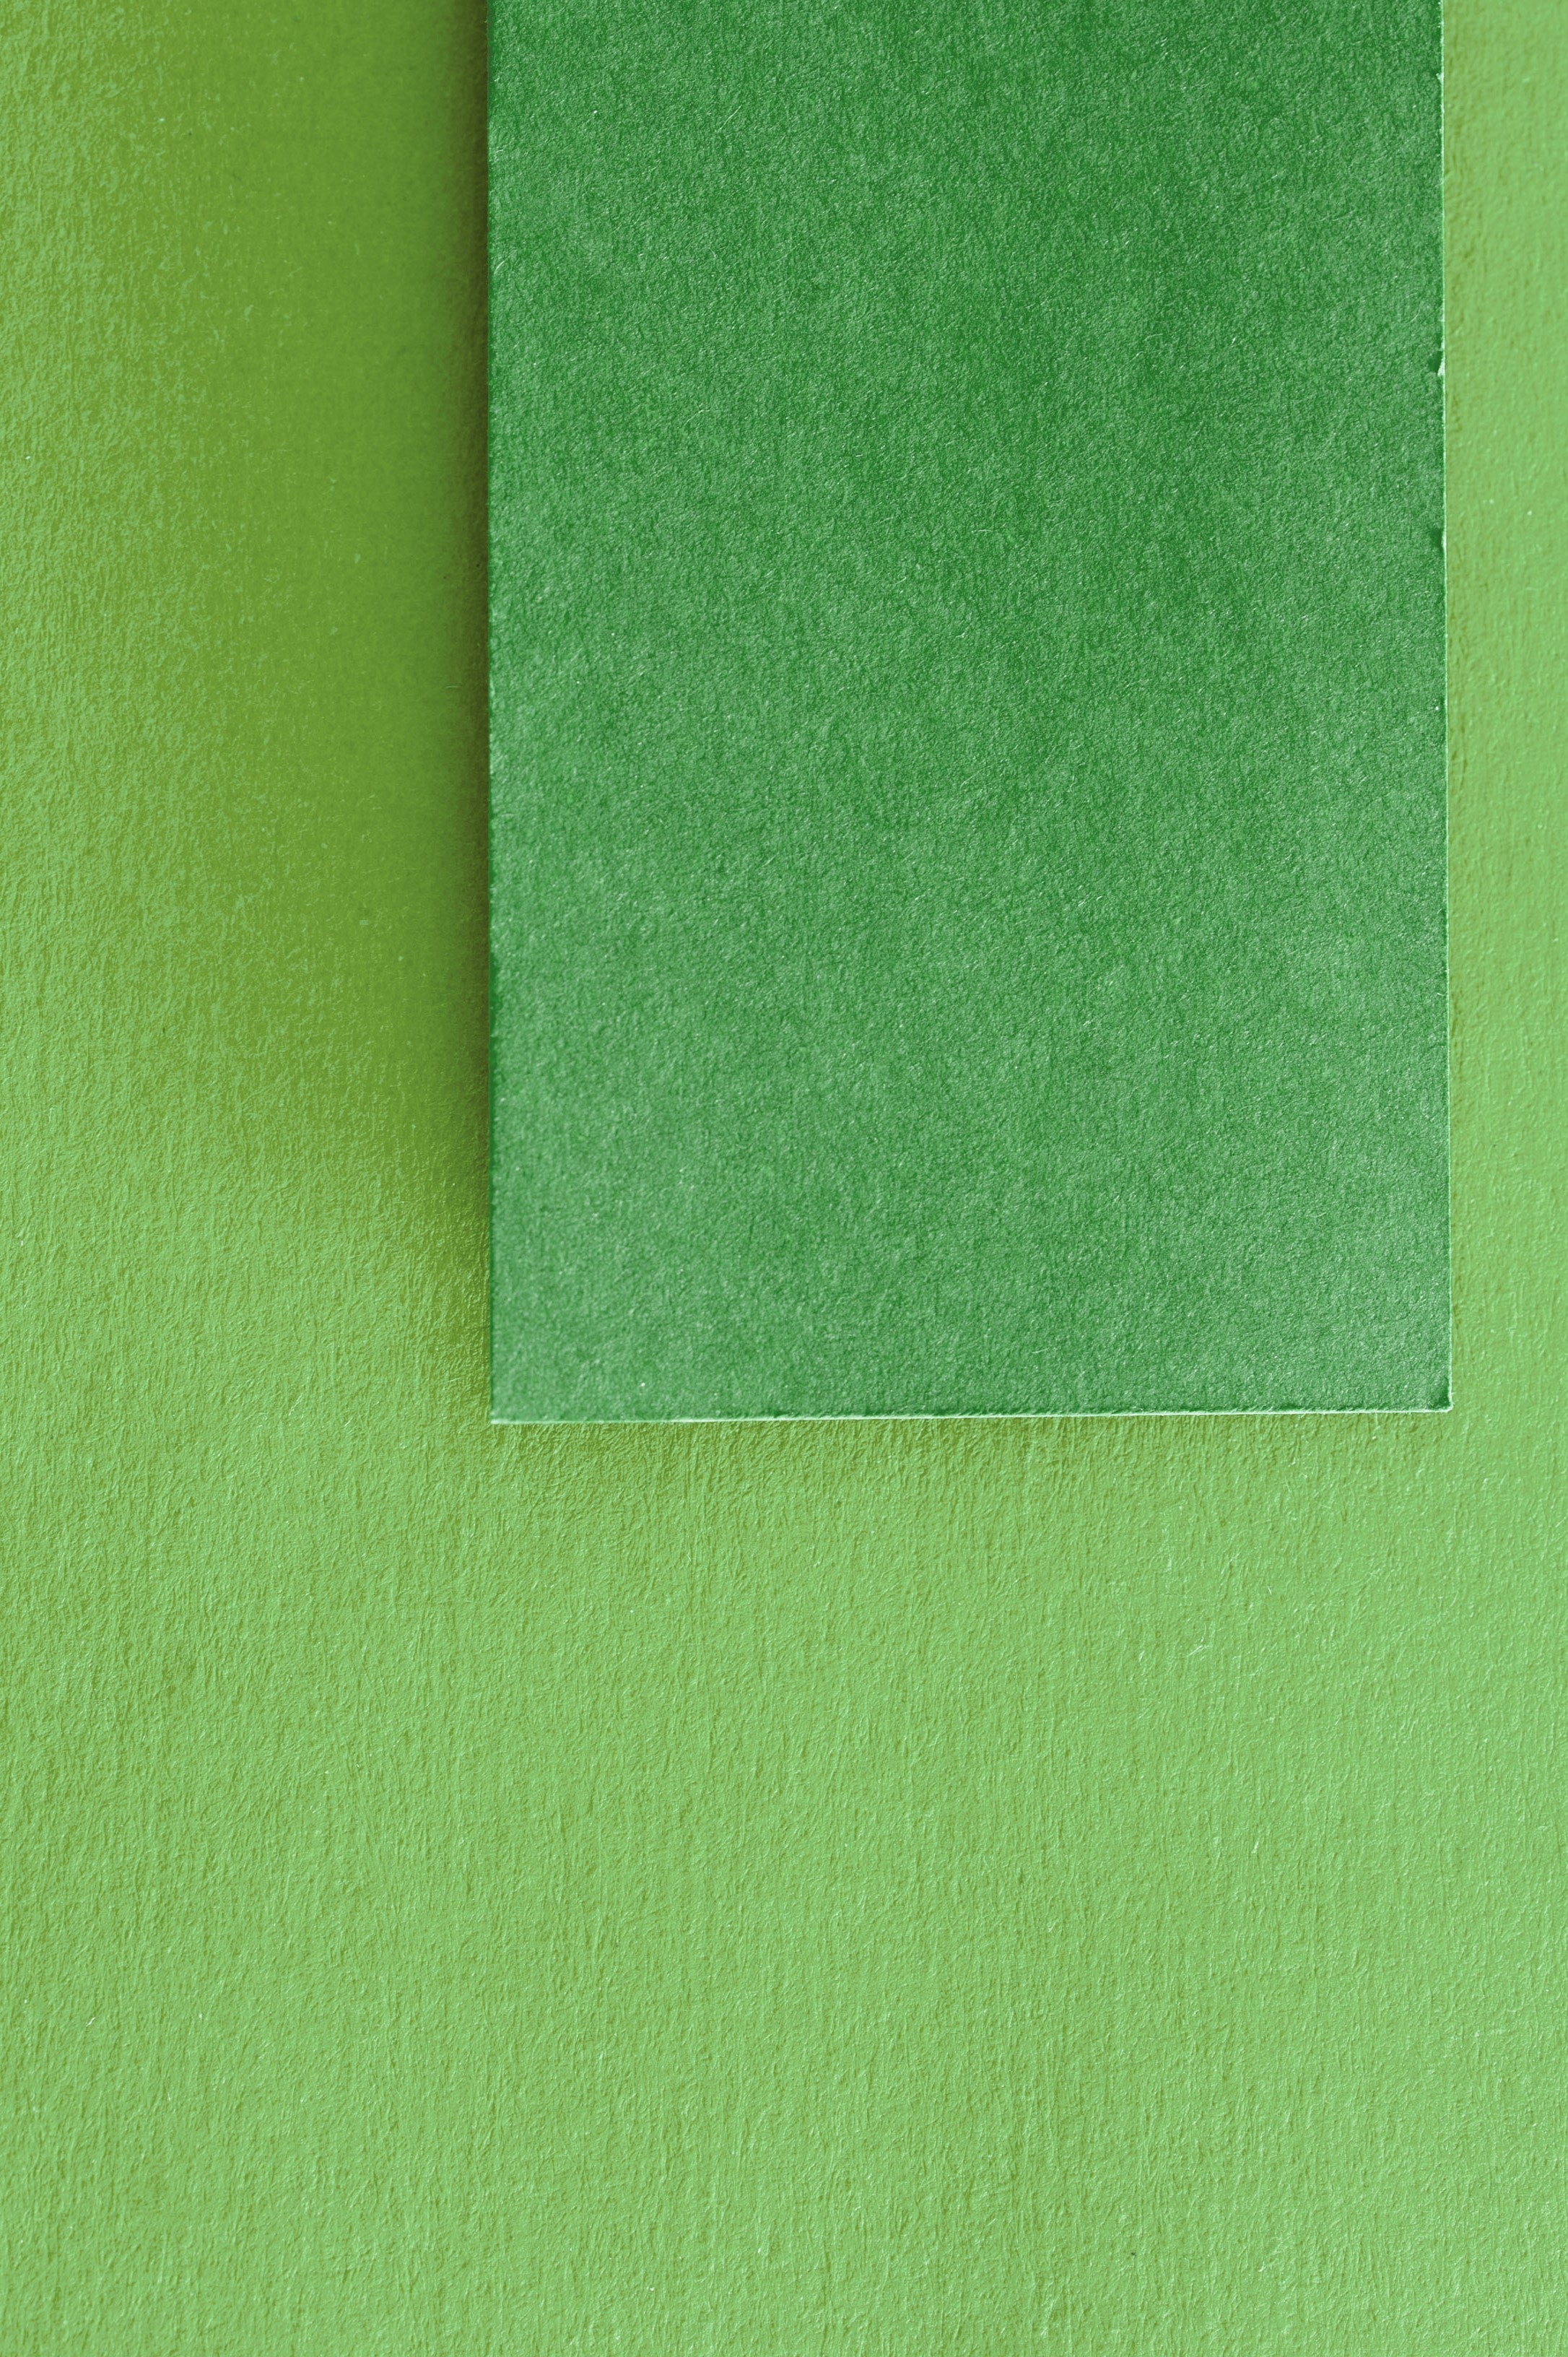 green paper tag